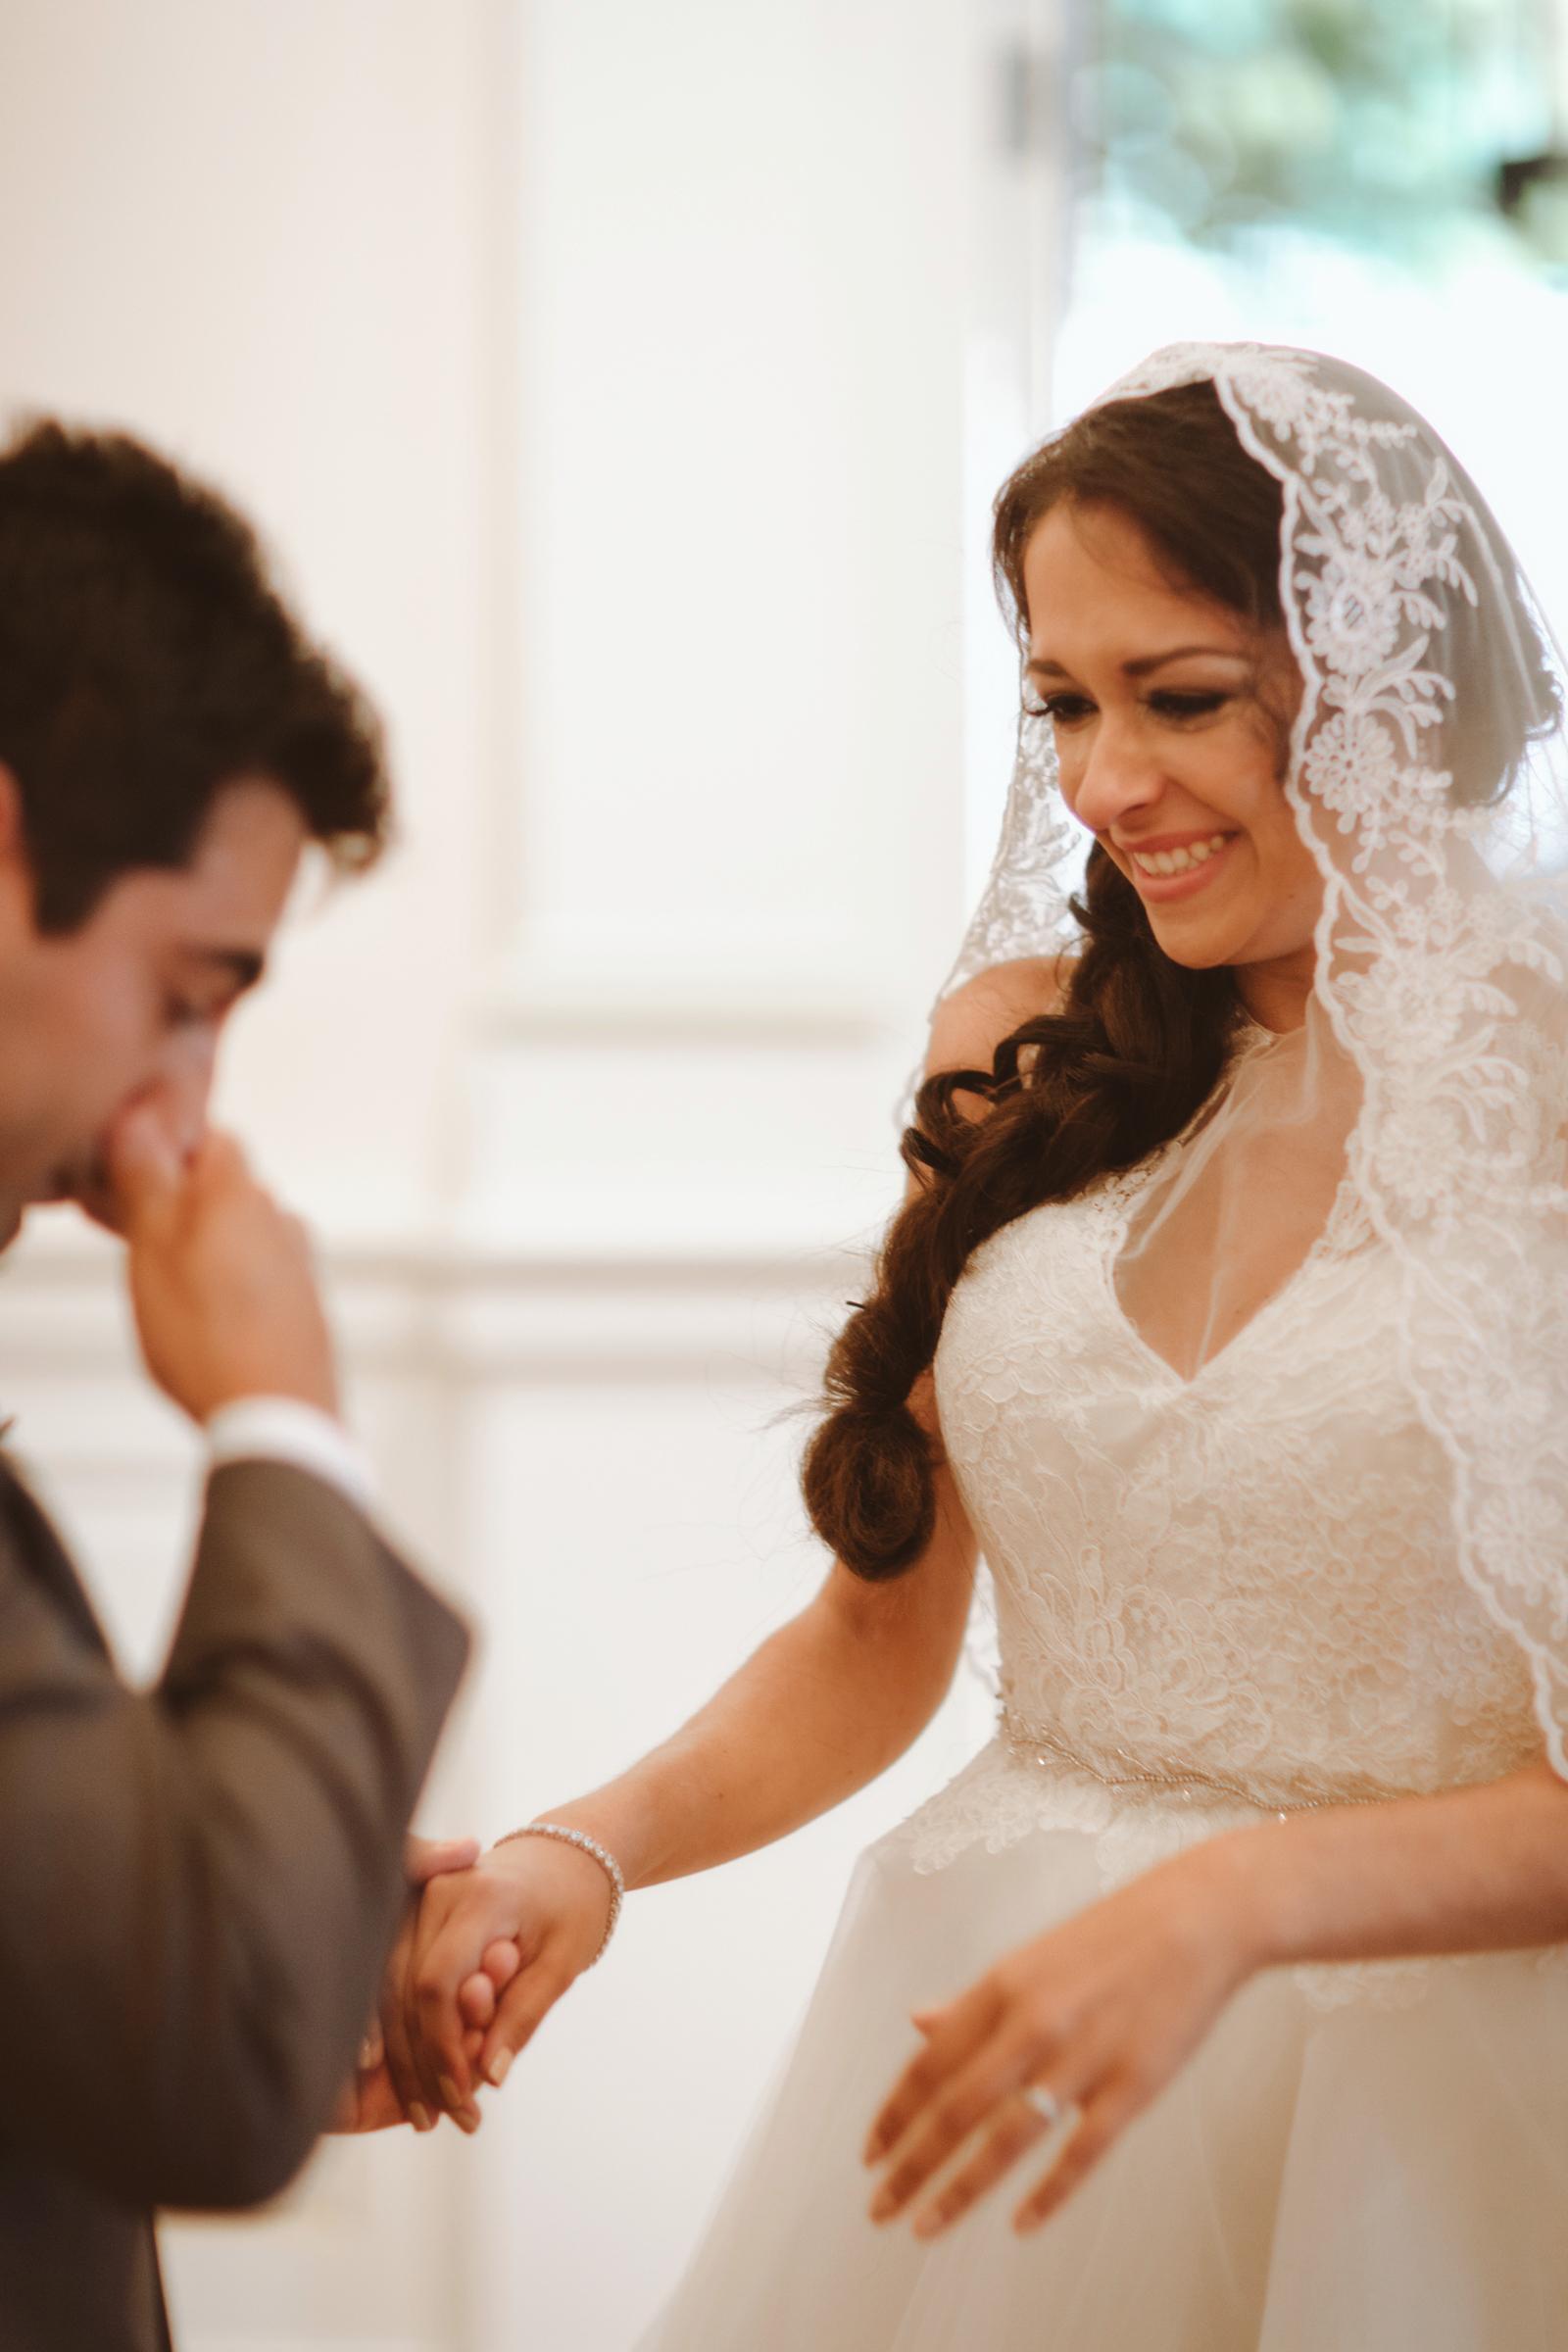 wedding day | MFA St Pete | Vanessa Boy Photography | vanessaboy.com-397.com |final.jpg